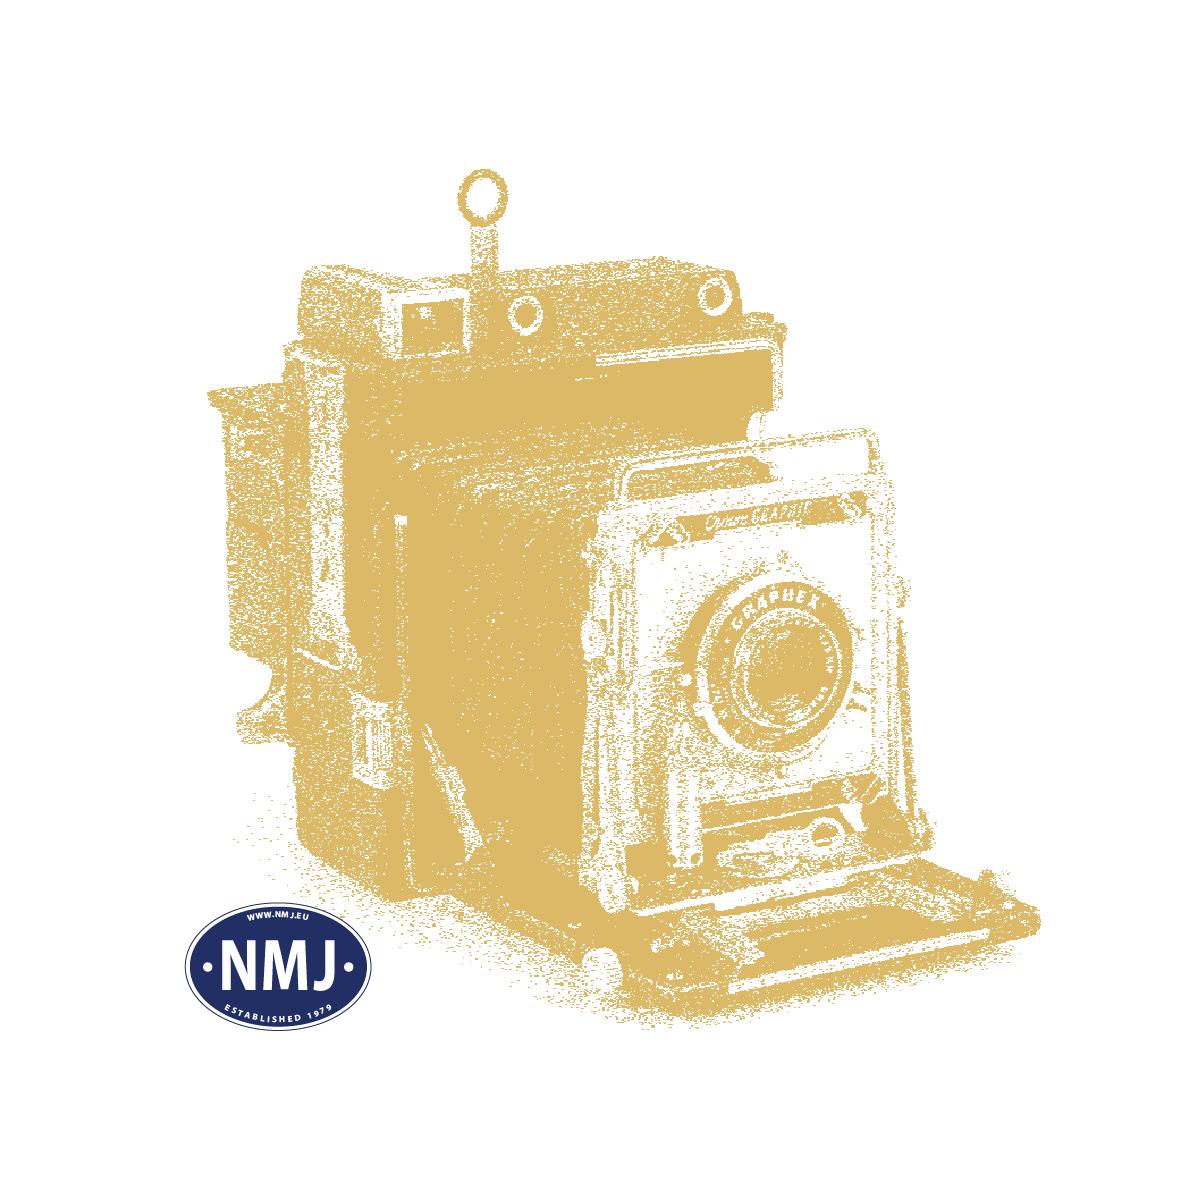 NMJT105.301 - NMJ Topline Personenwagen A2 24002 der NSB, rot